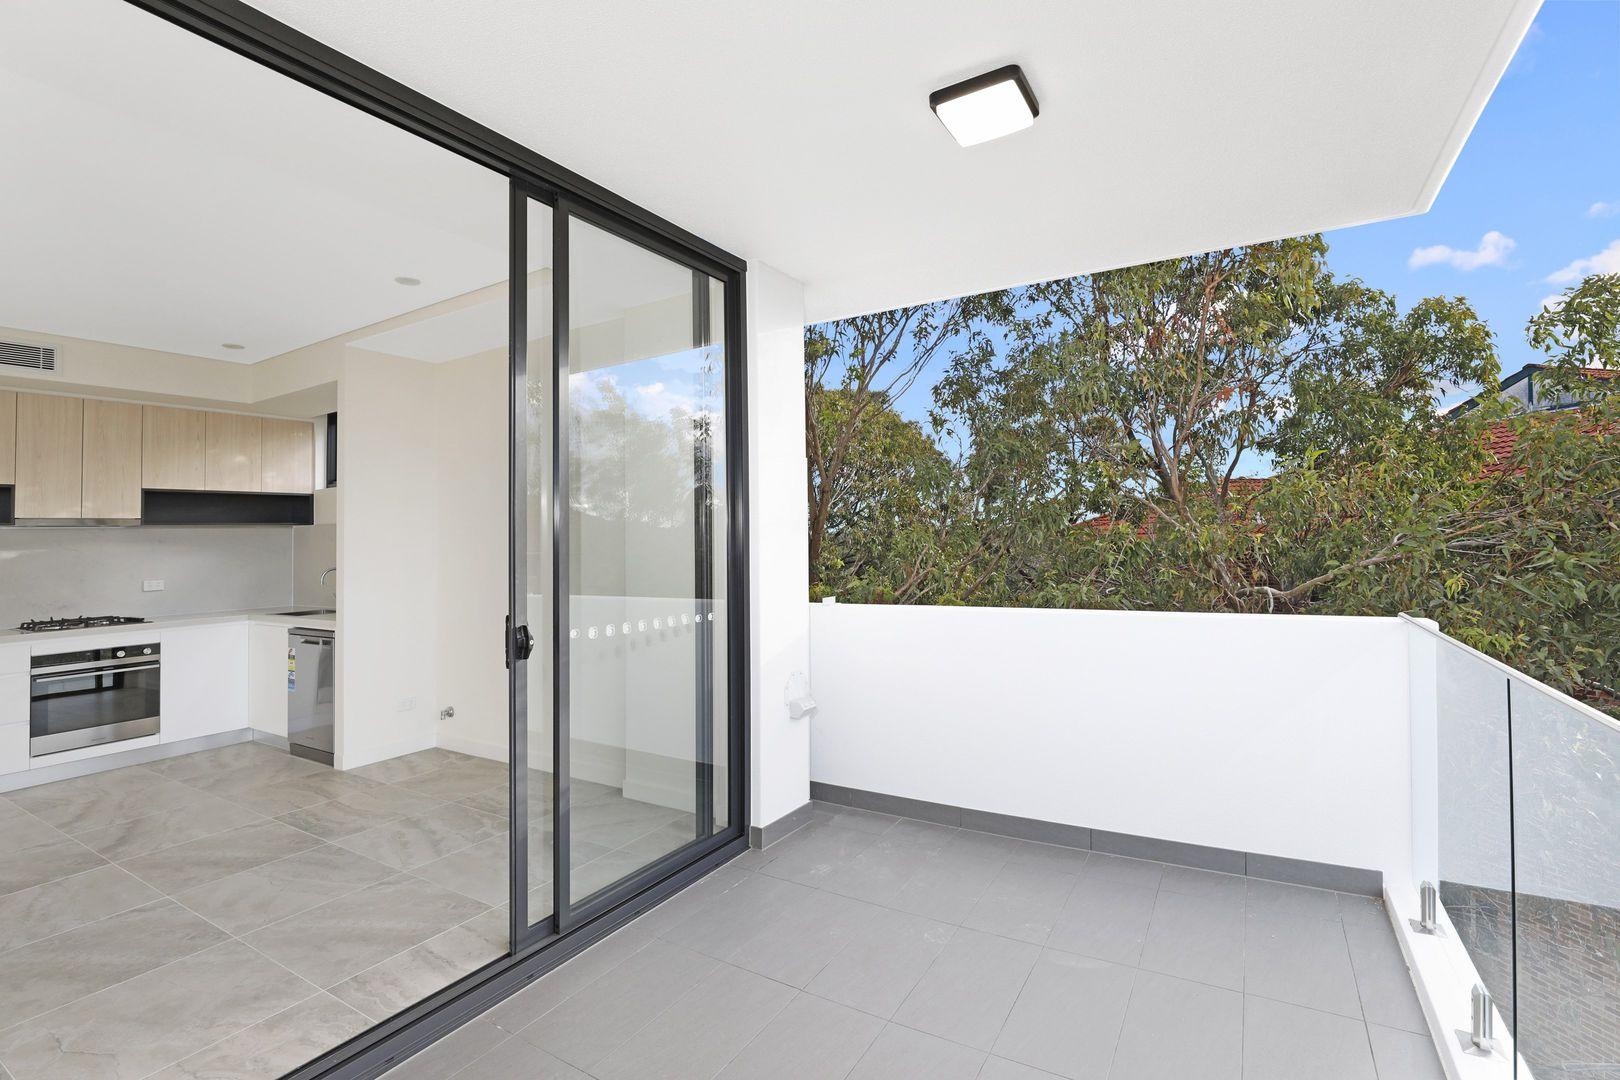 13/377 Kingsway, Caringbah NSW 2229, Image 1